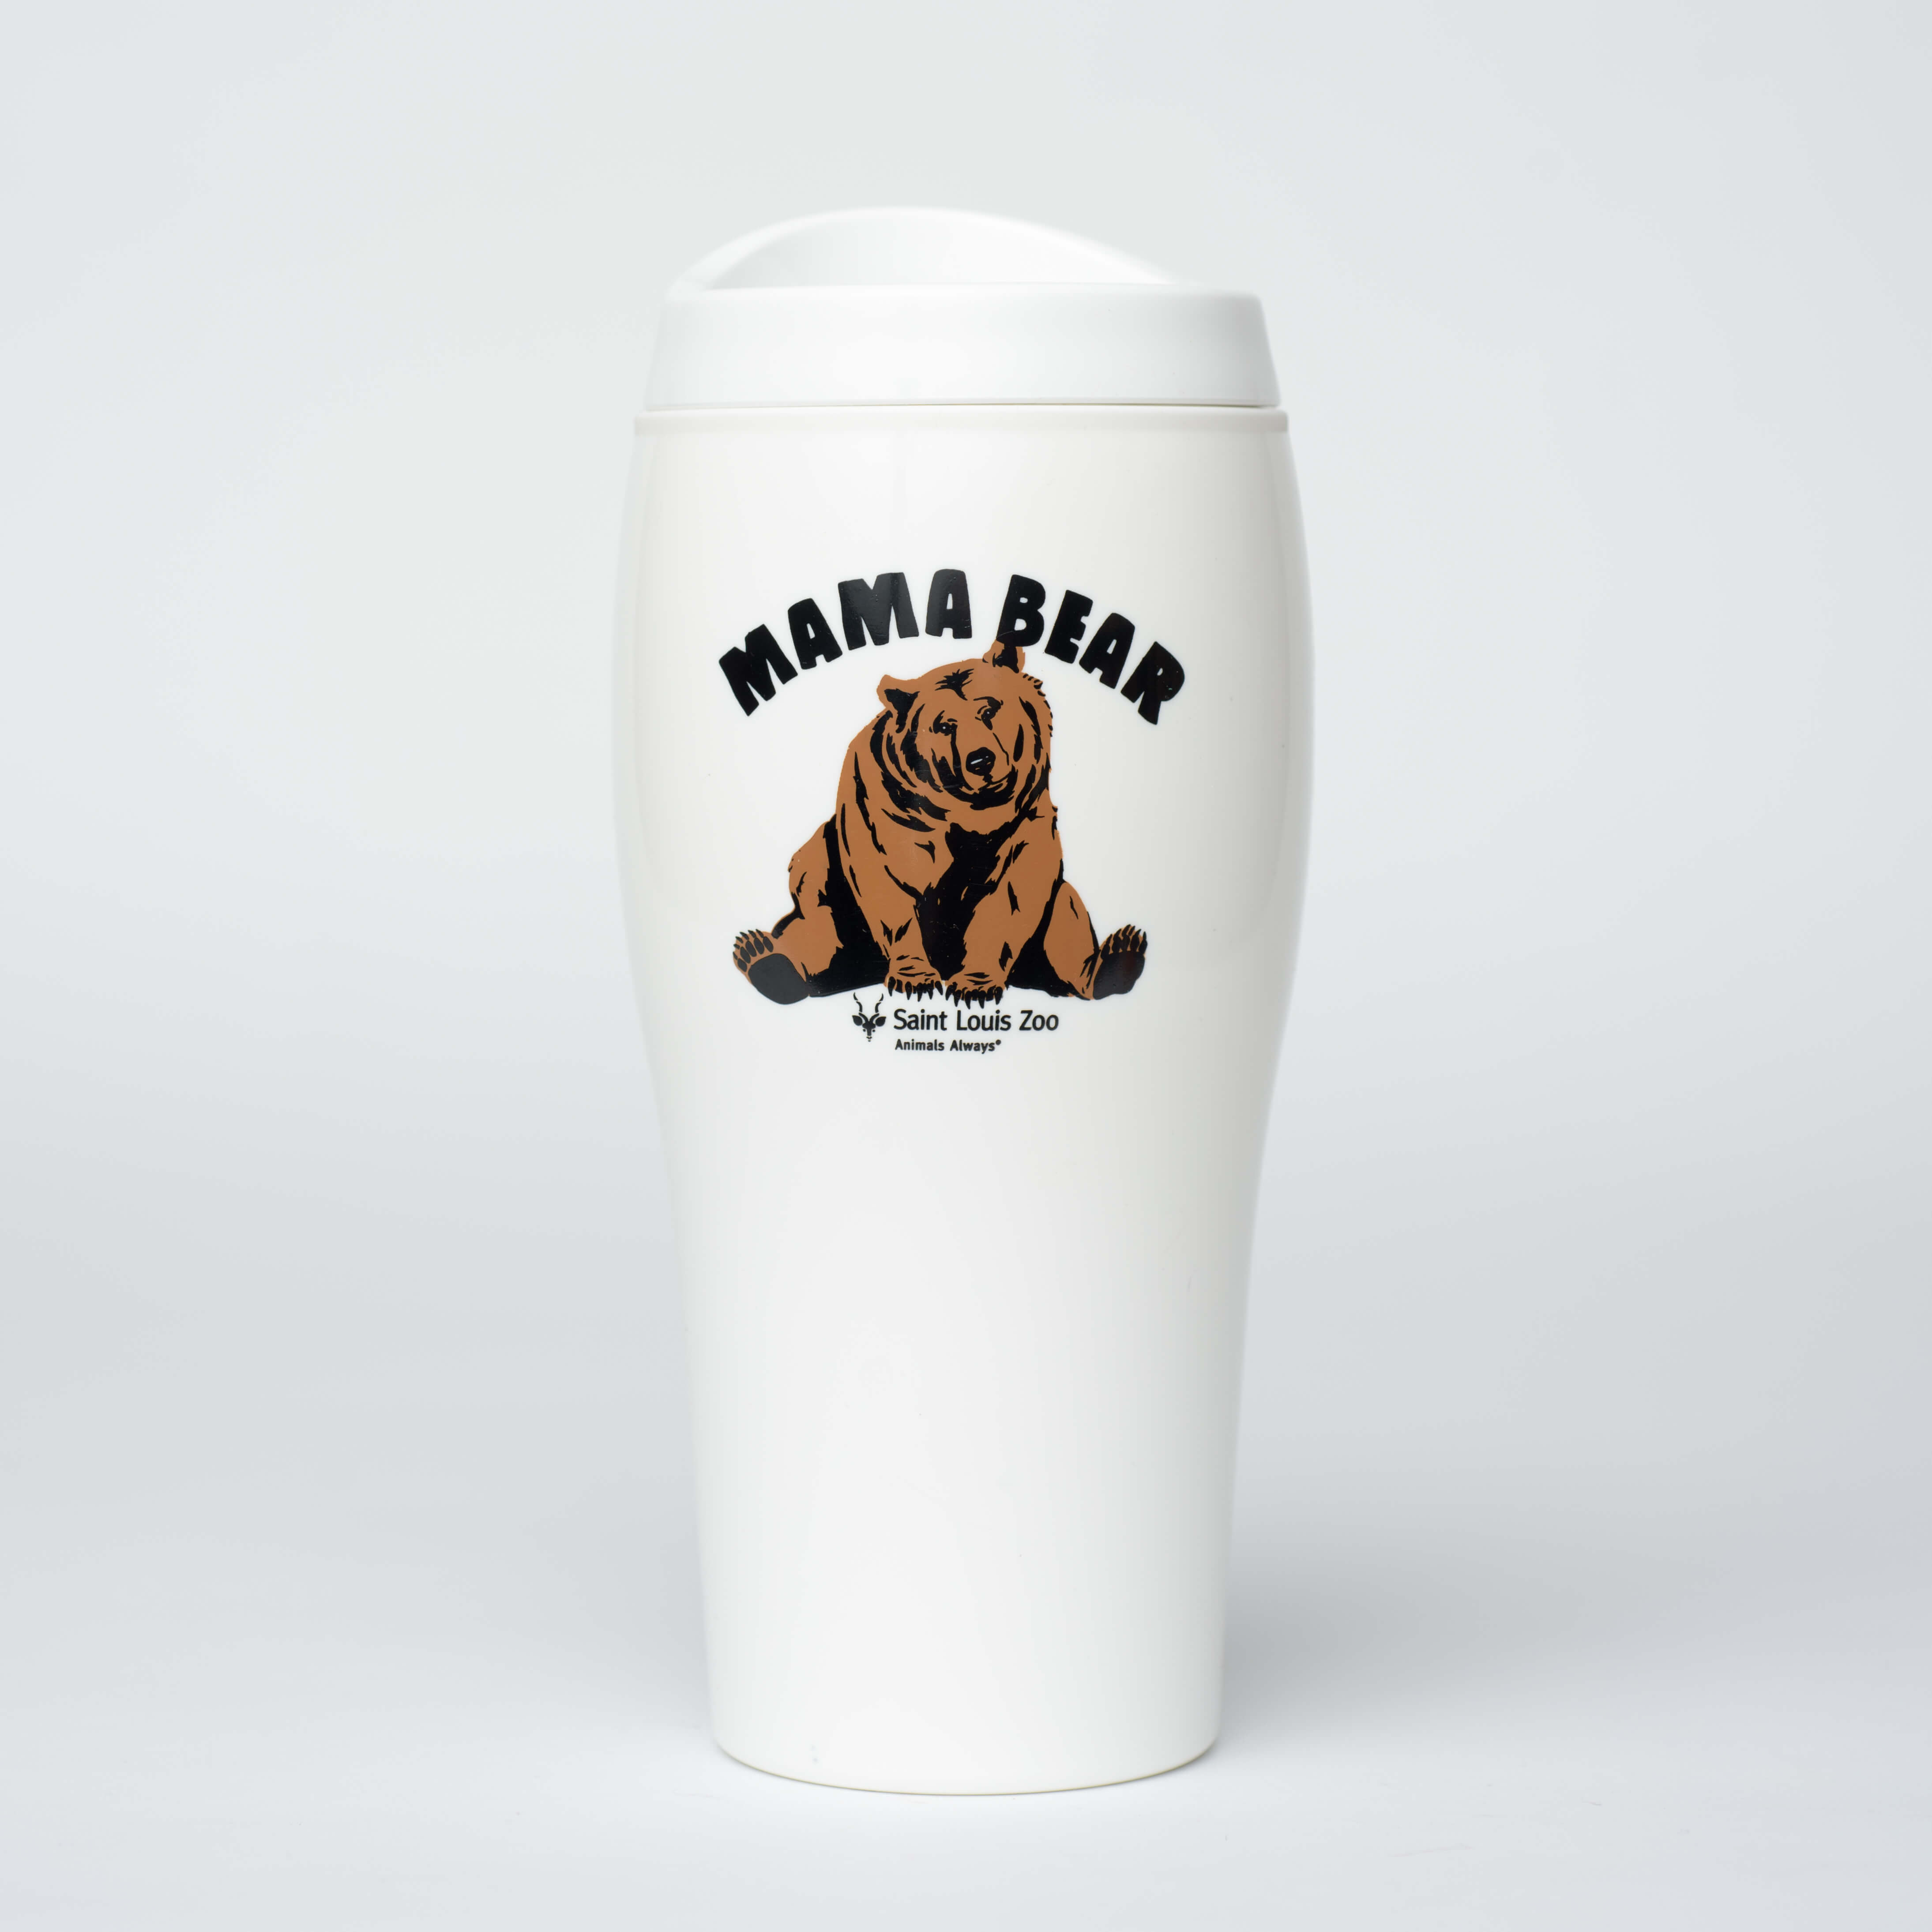 Image of Mama Bear insulated travel mug